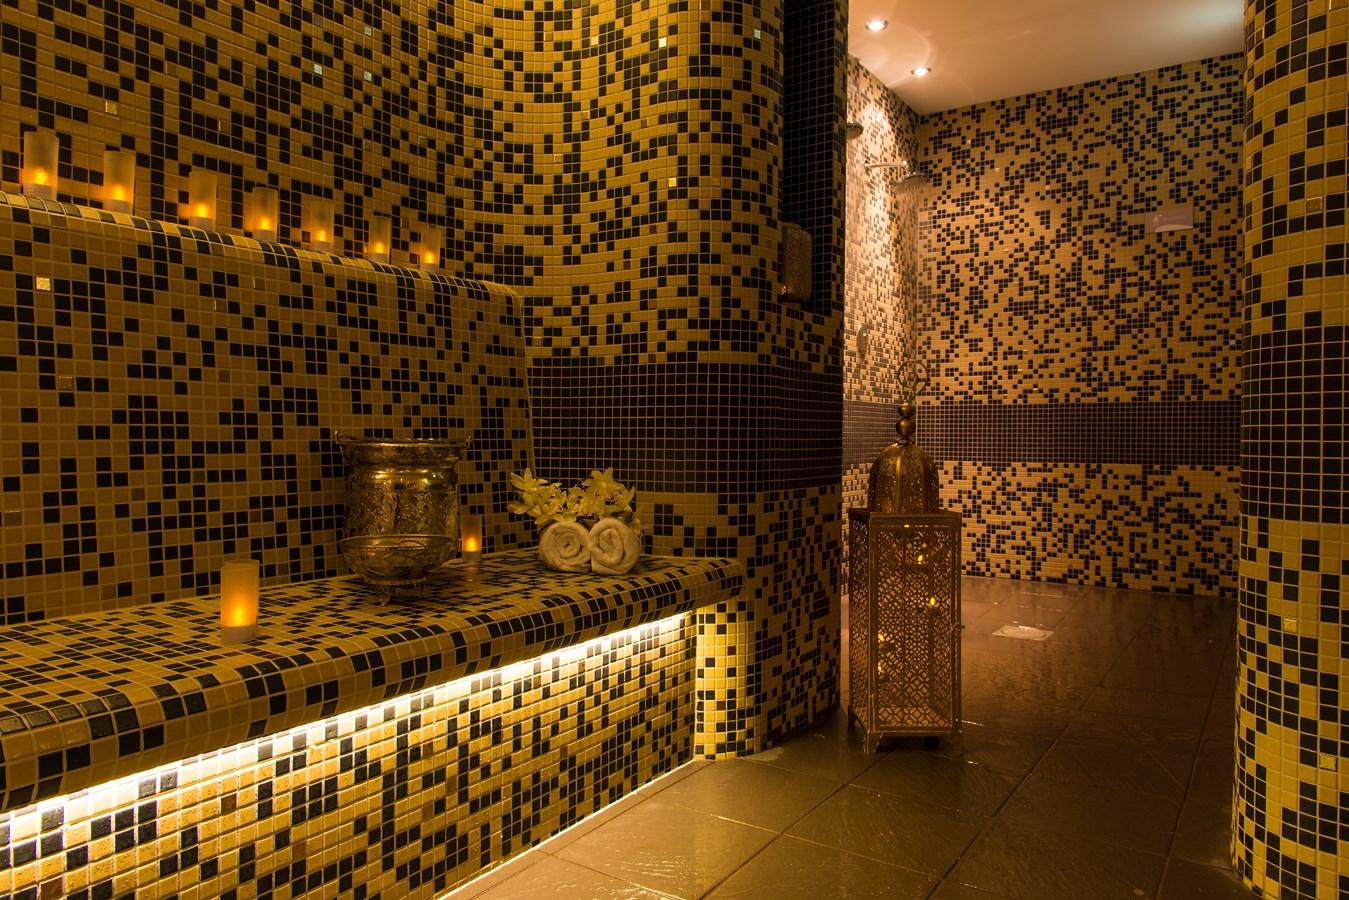 banquette chauffante @VitalSpa Vital spa Decathlon Village Bouc Bel Air -